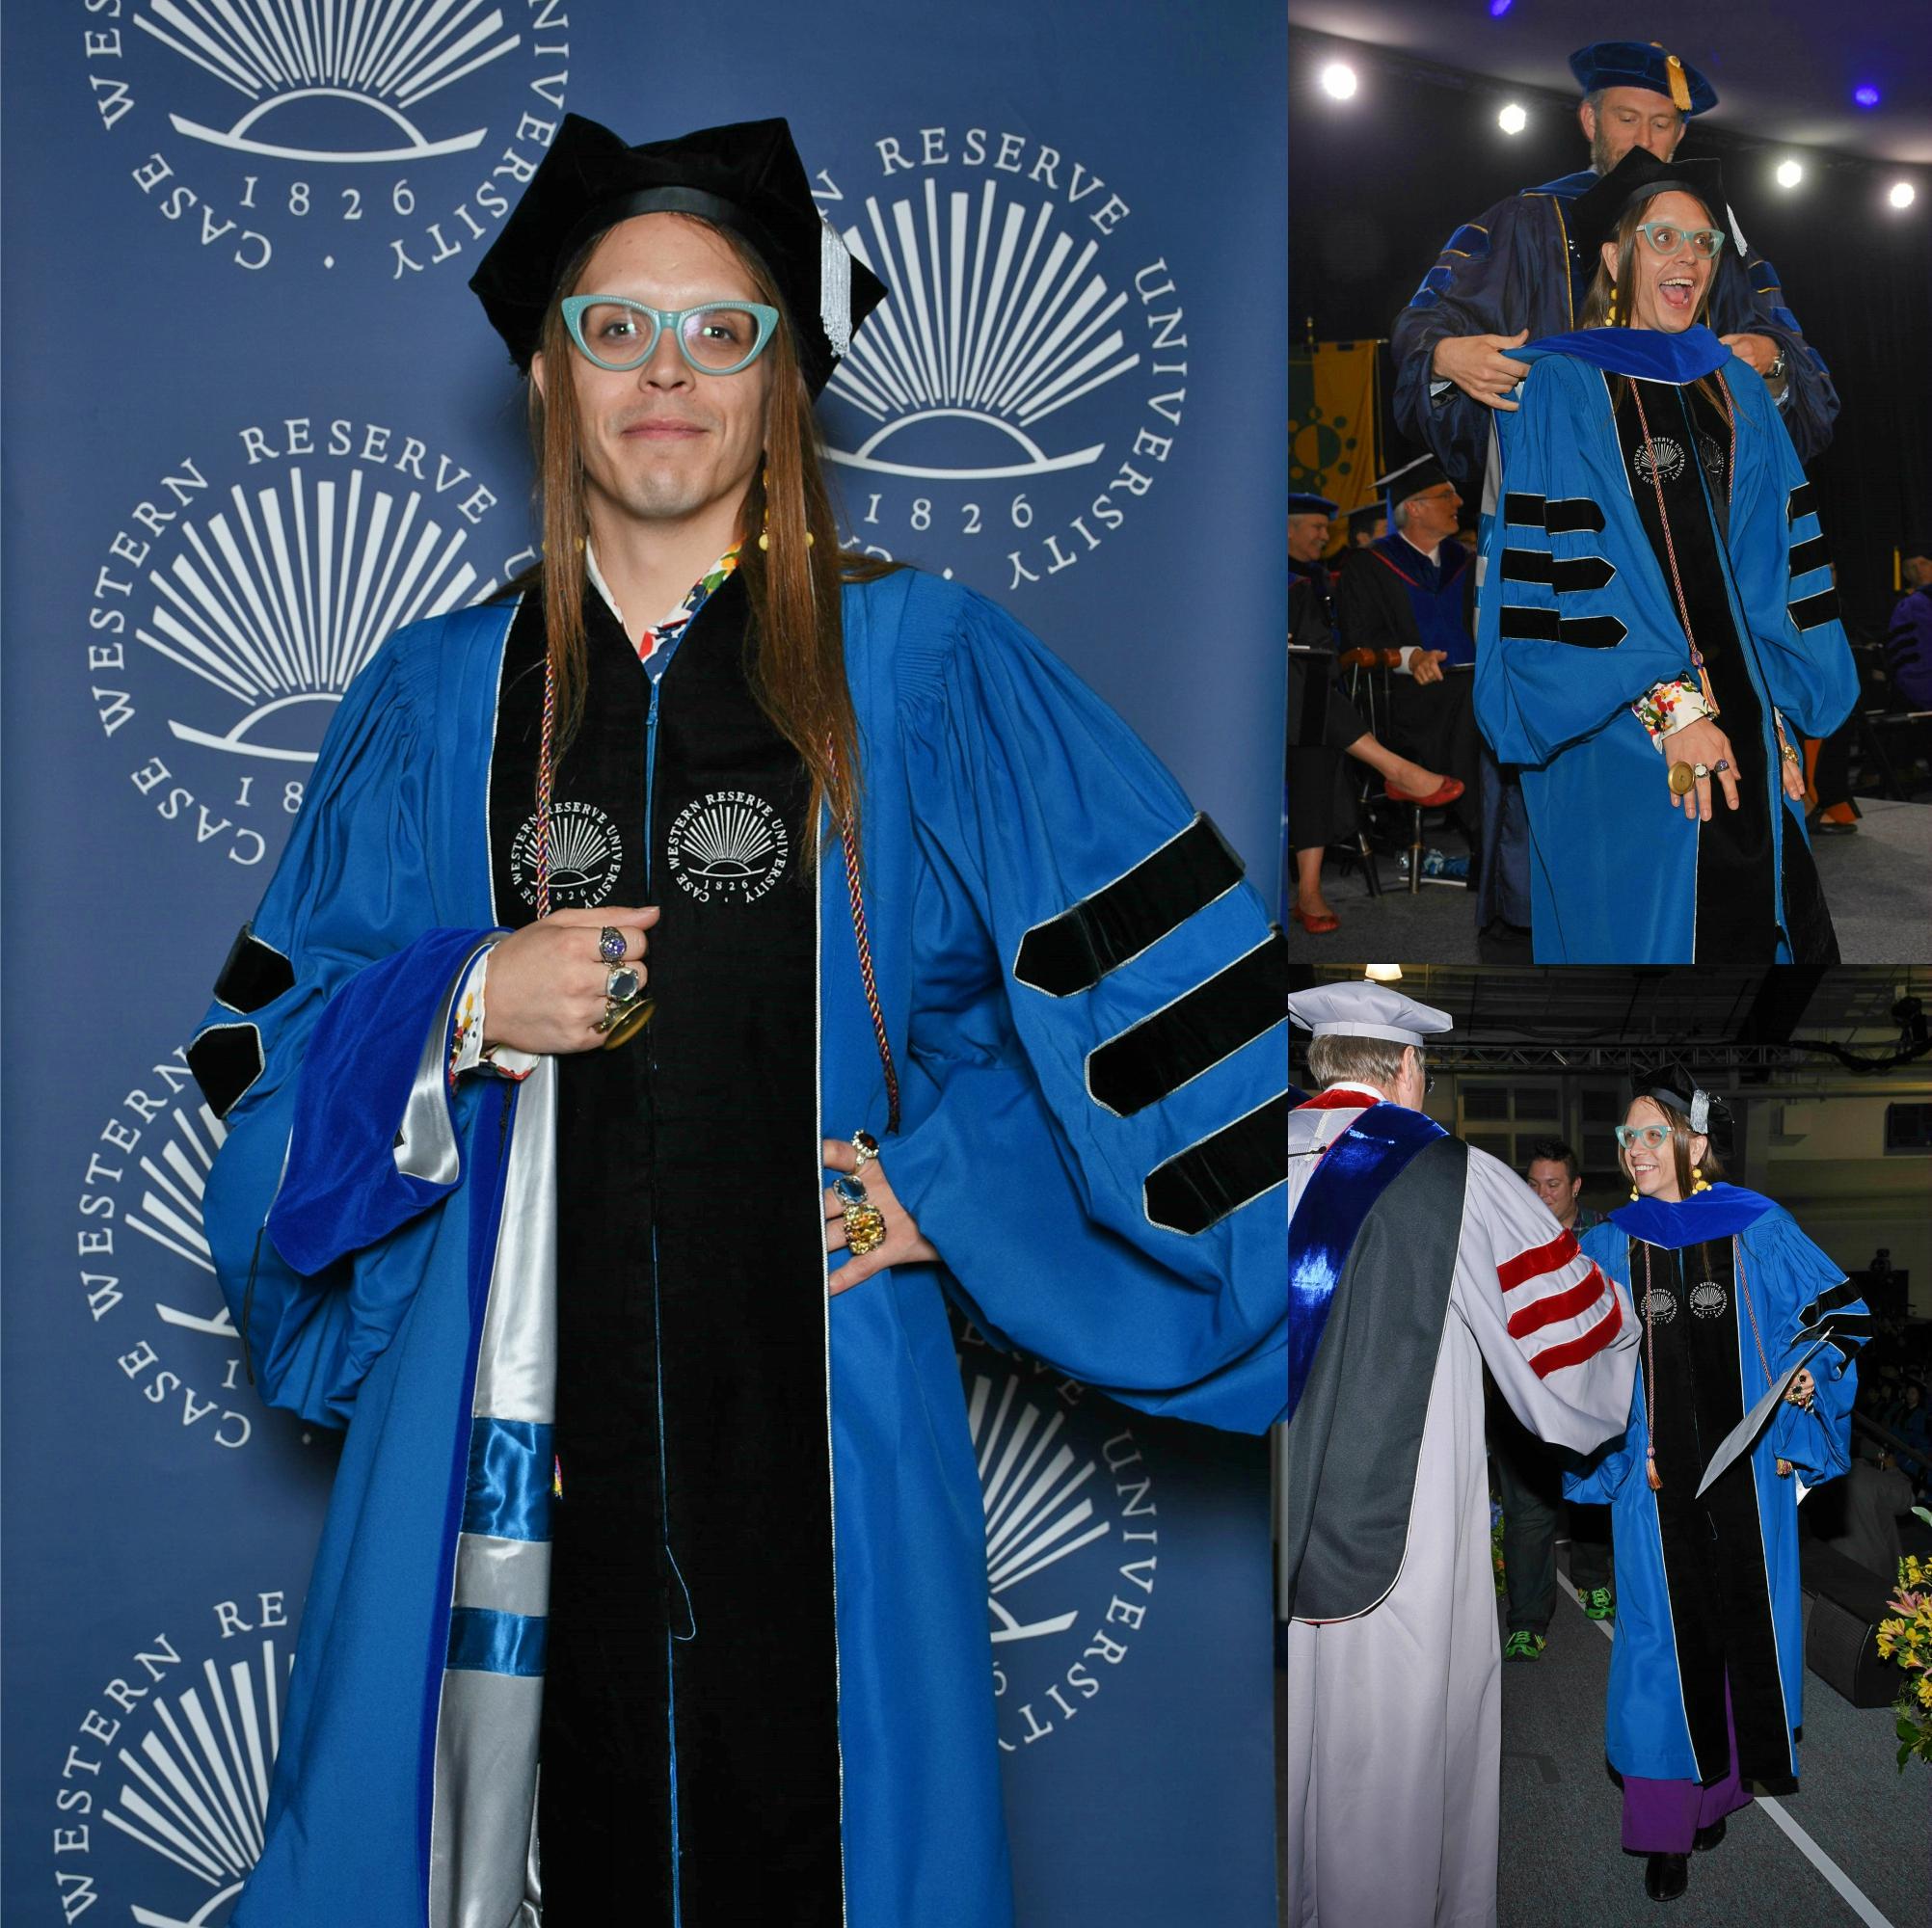 Graduationimages.jpg